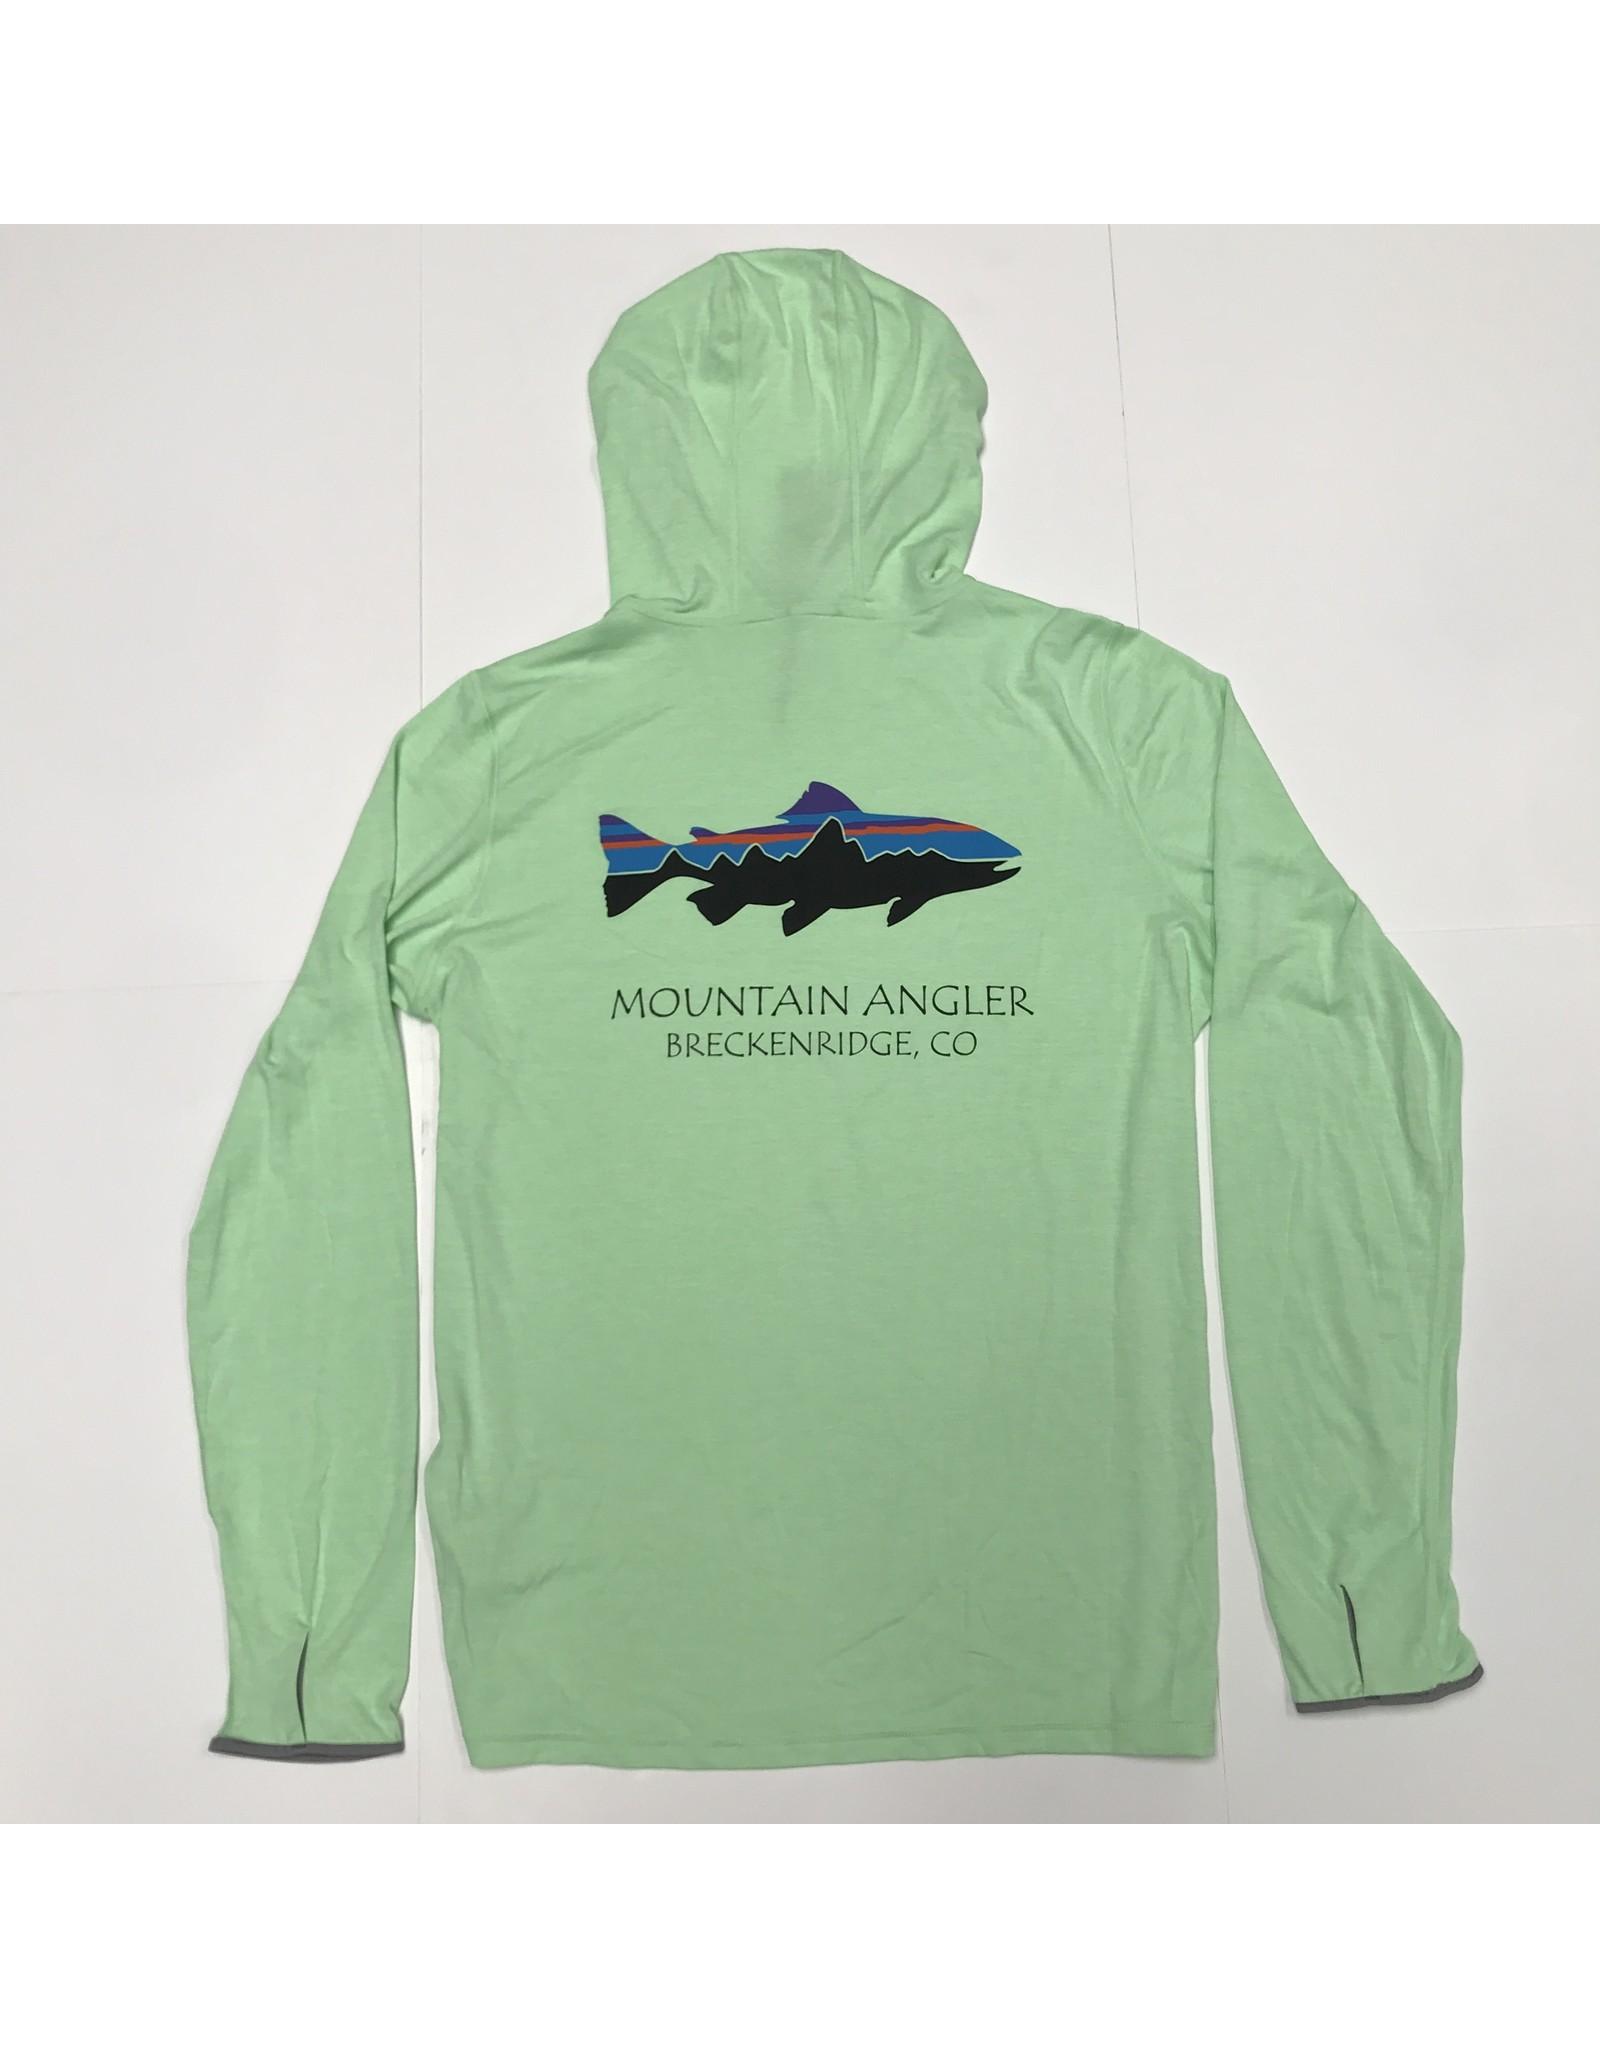 Patagonia Patagonia - Tropic Comfort MOUNTAIN ANGLER LOGO Hoody